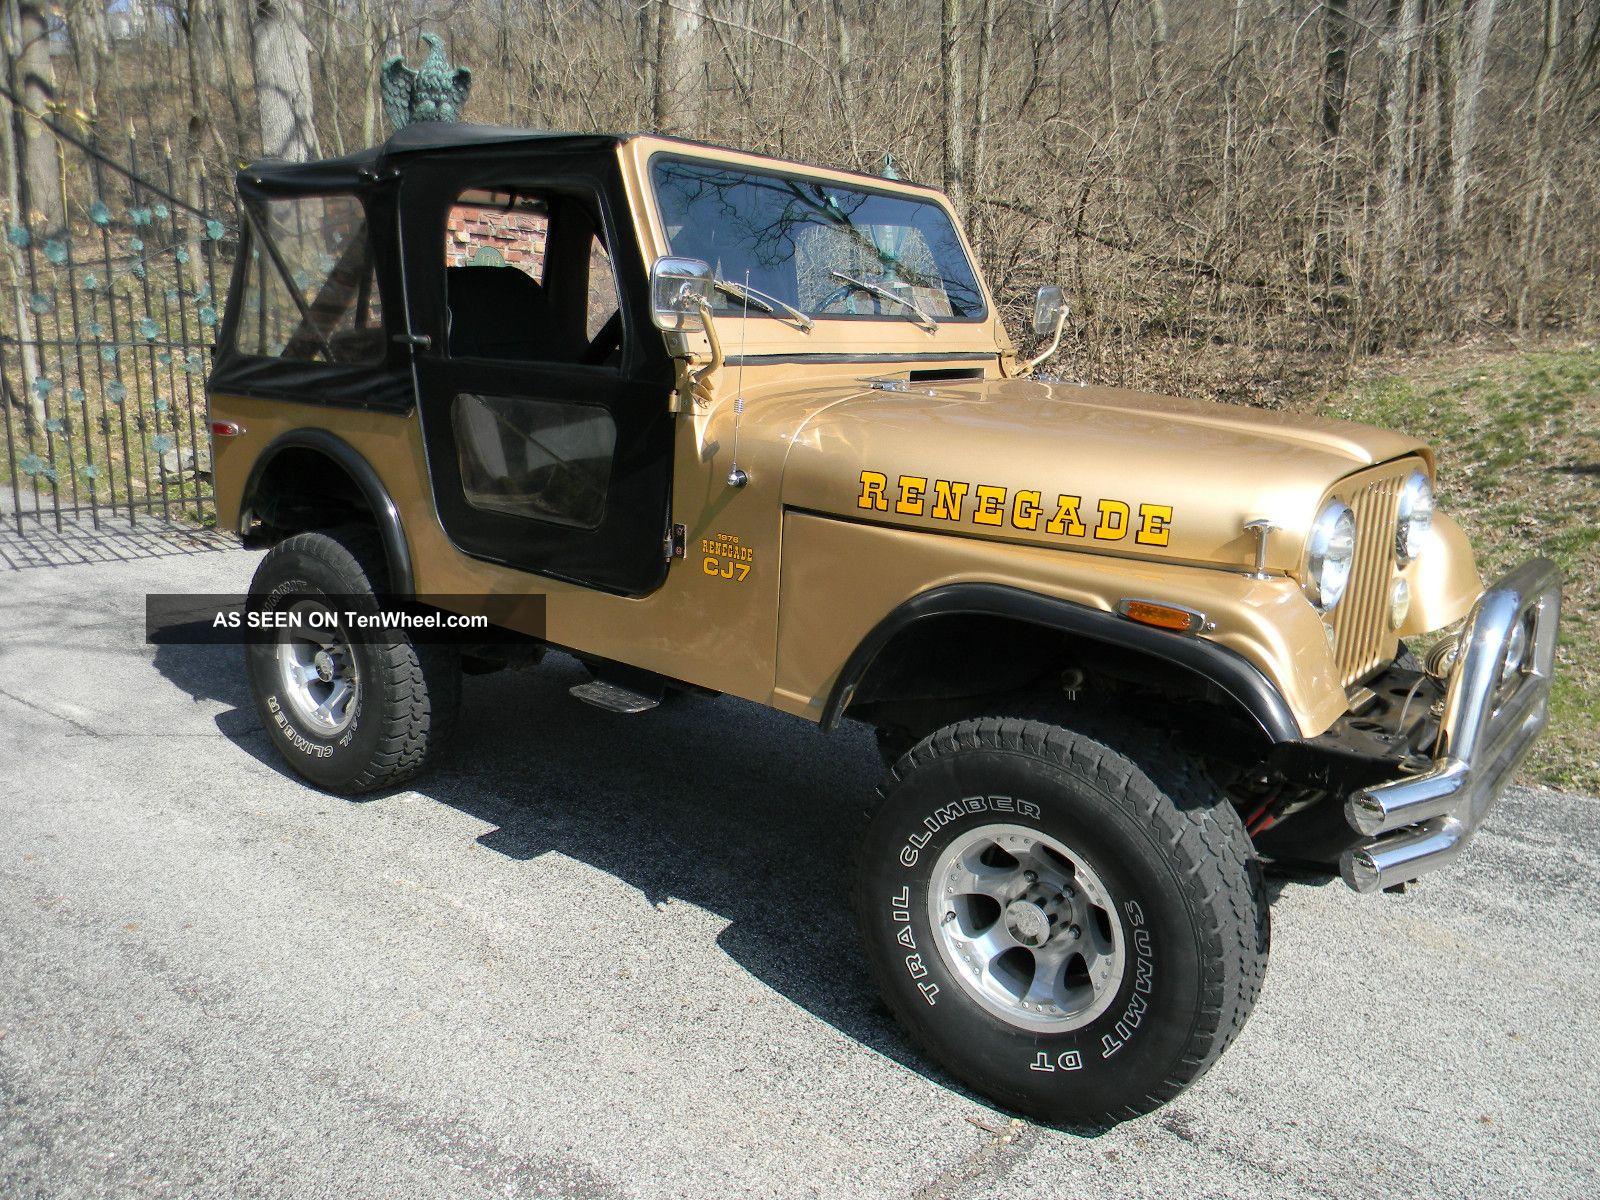 1976 jeep cj7 renegade sport utility 2 door 5 0l. Black Bedroom Furniture Sets. Home Design Ideas